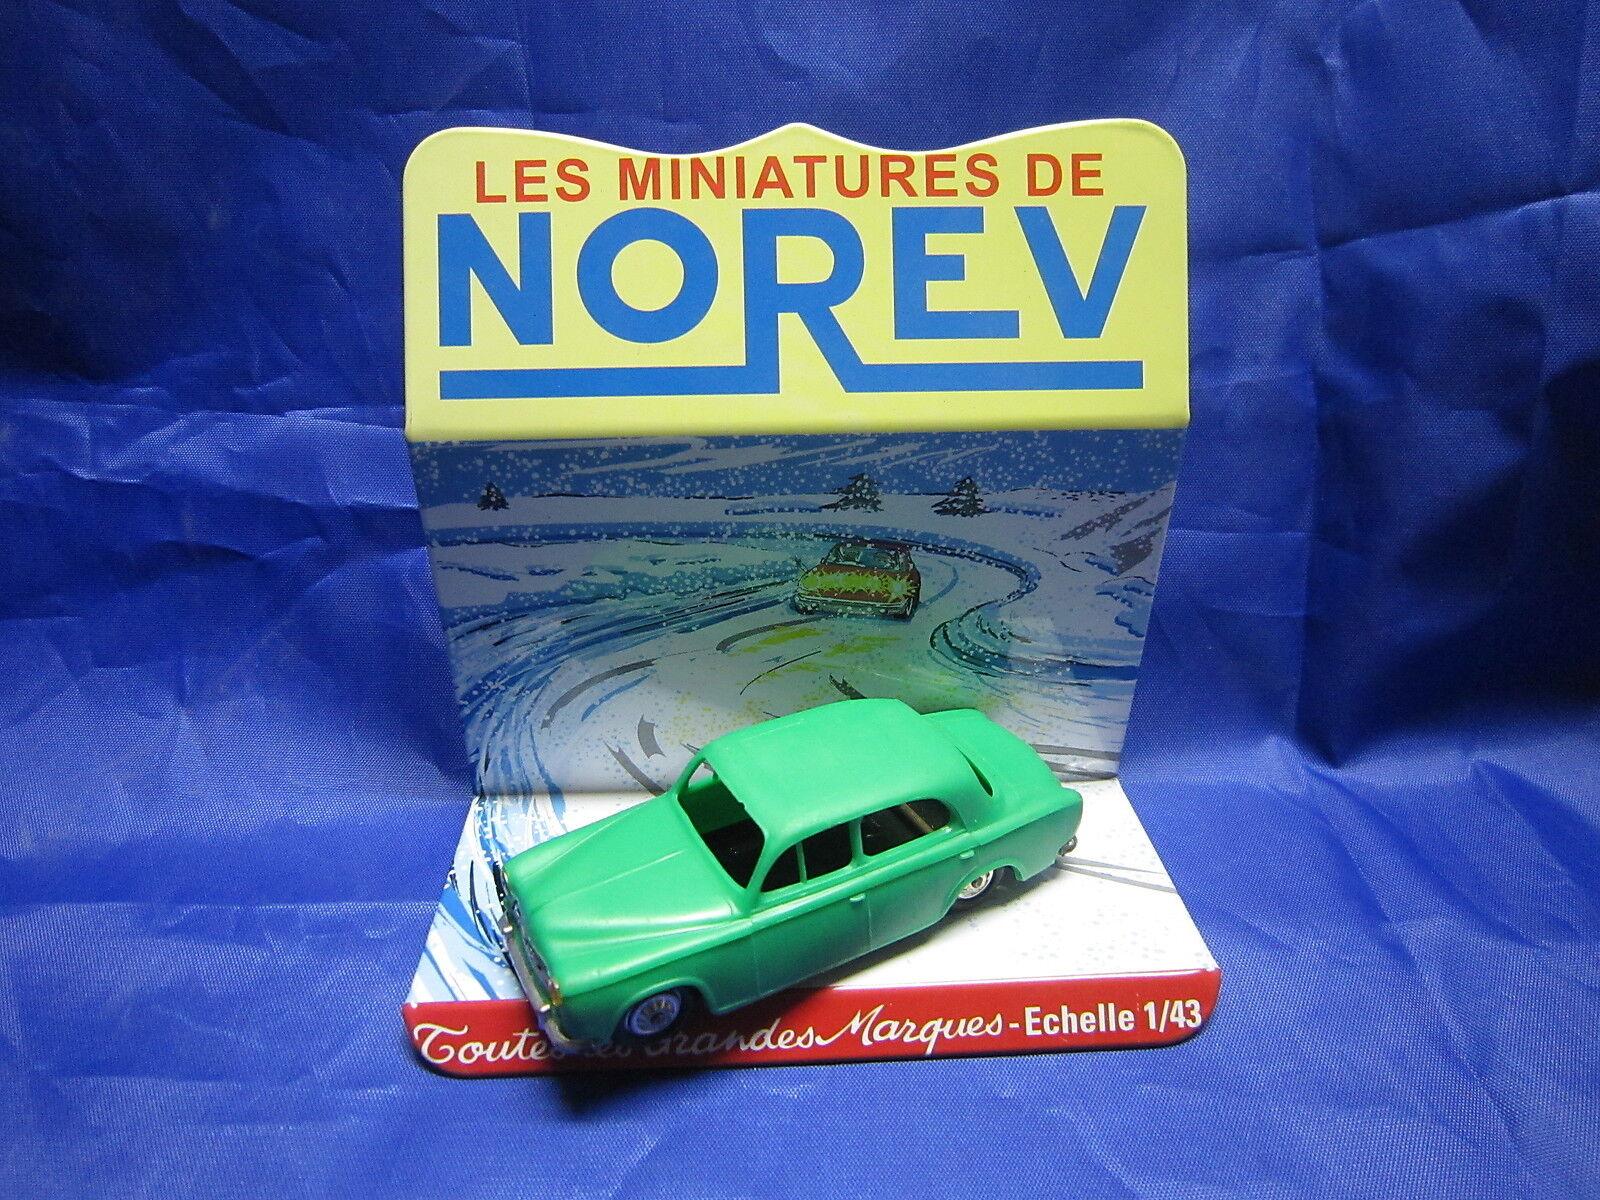 DV6239 NOREV PEUGEOT 403 BERLINE PLASTIQUE VERT MAT Ref 15 1 43 TBE